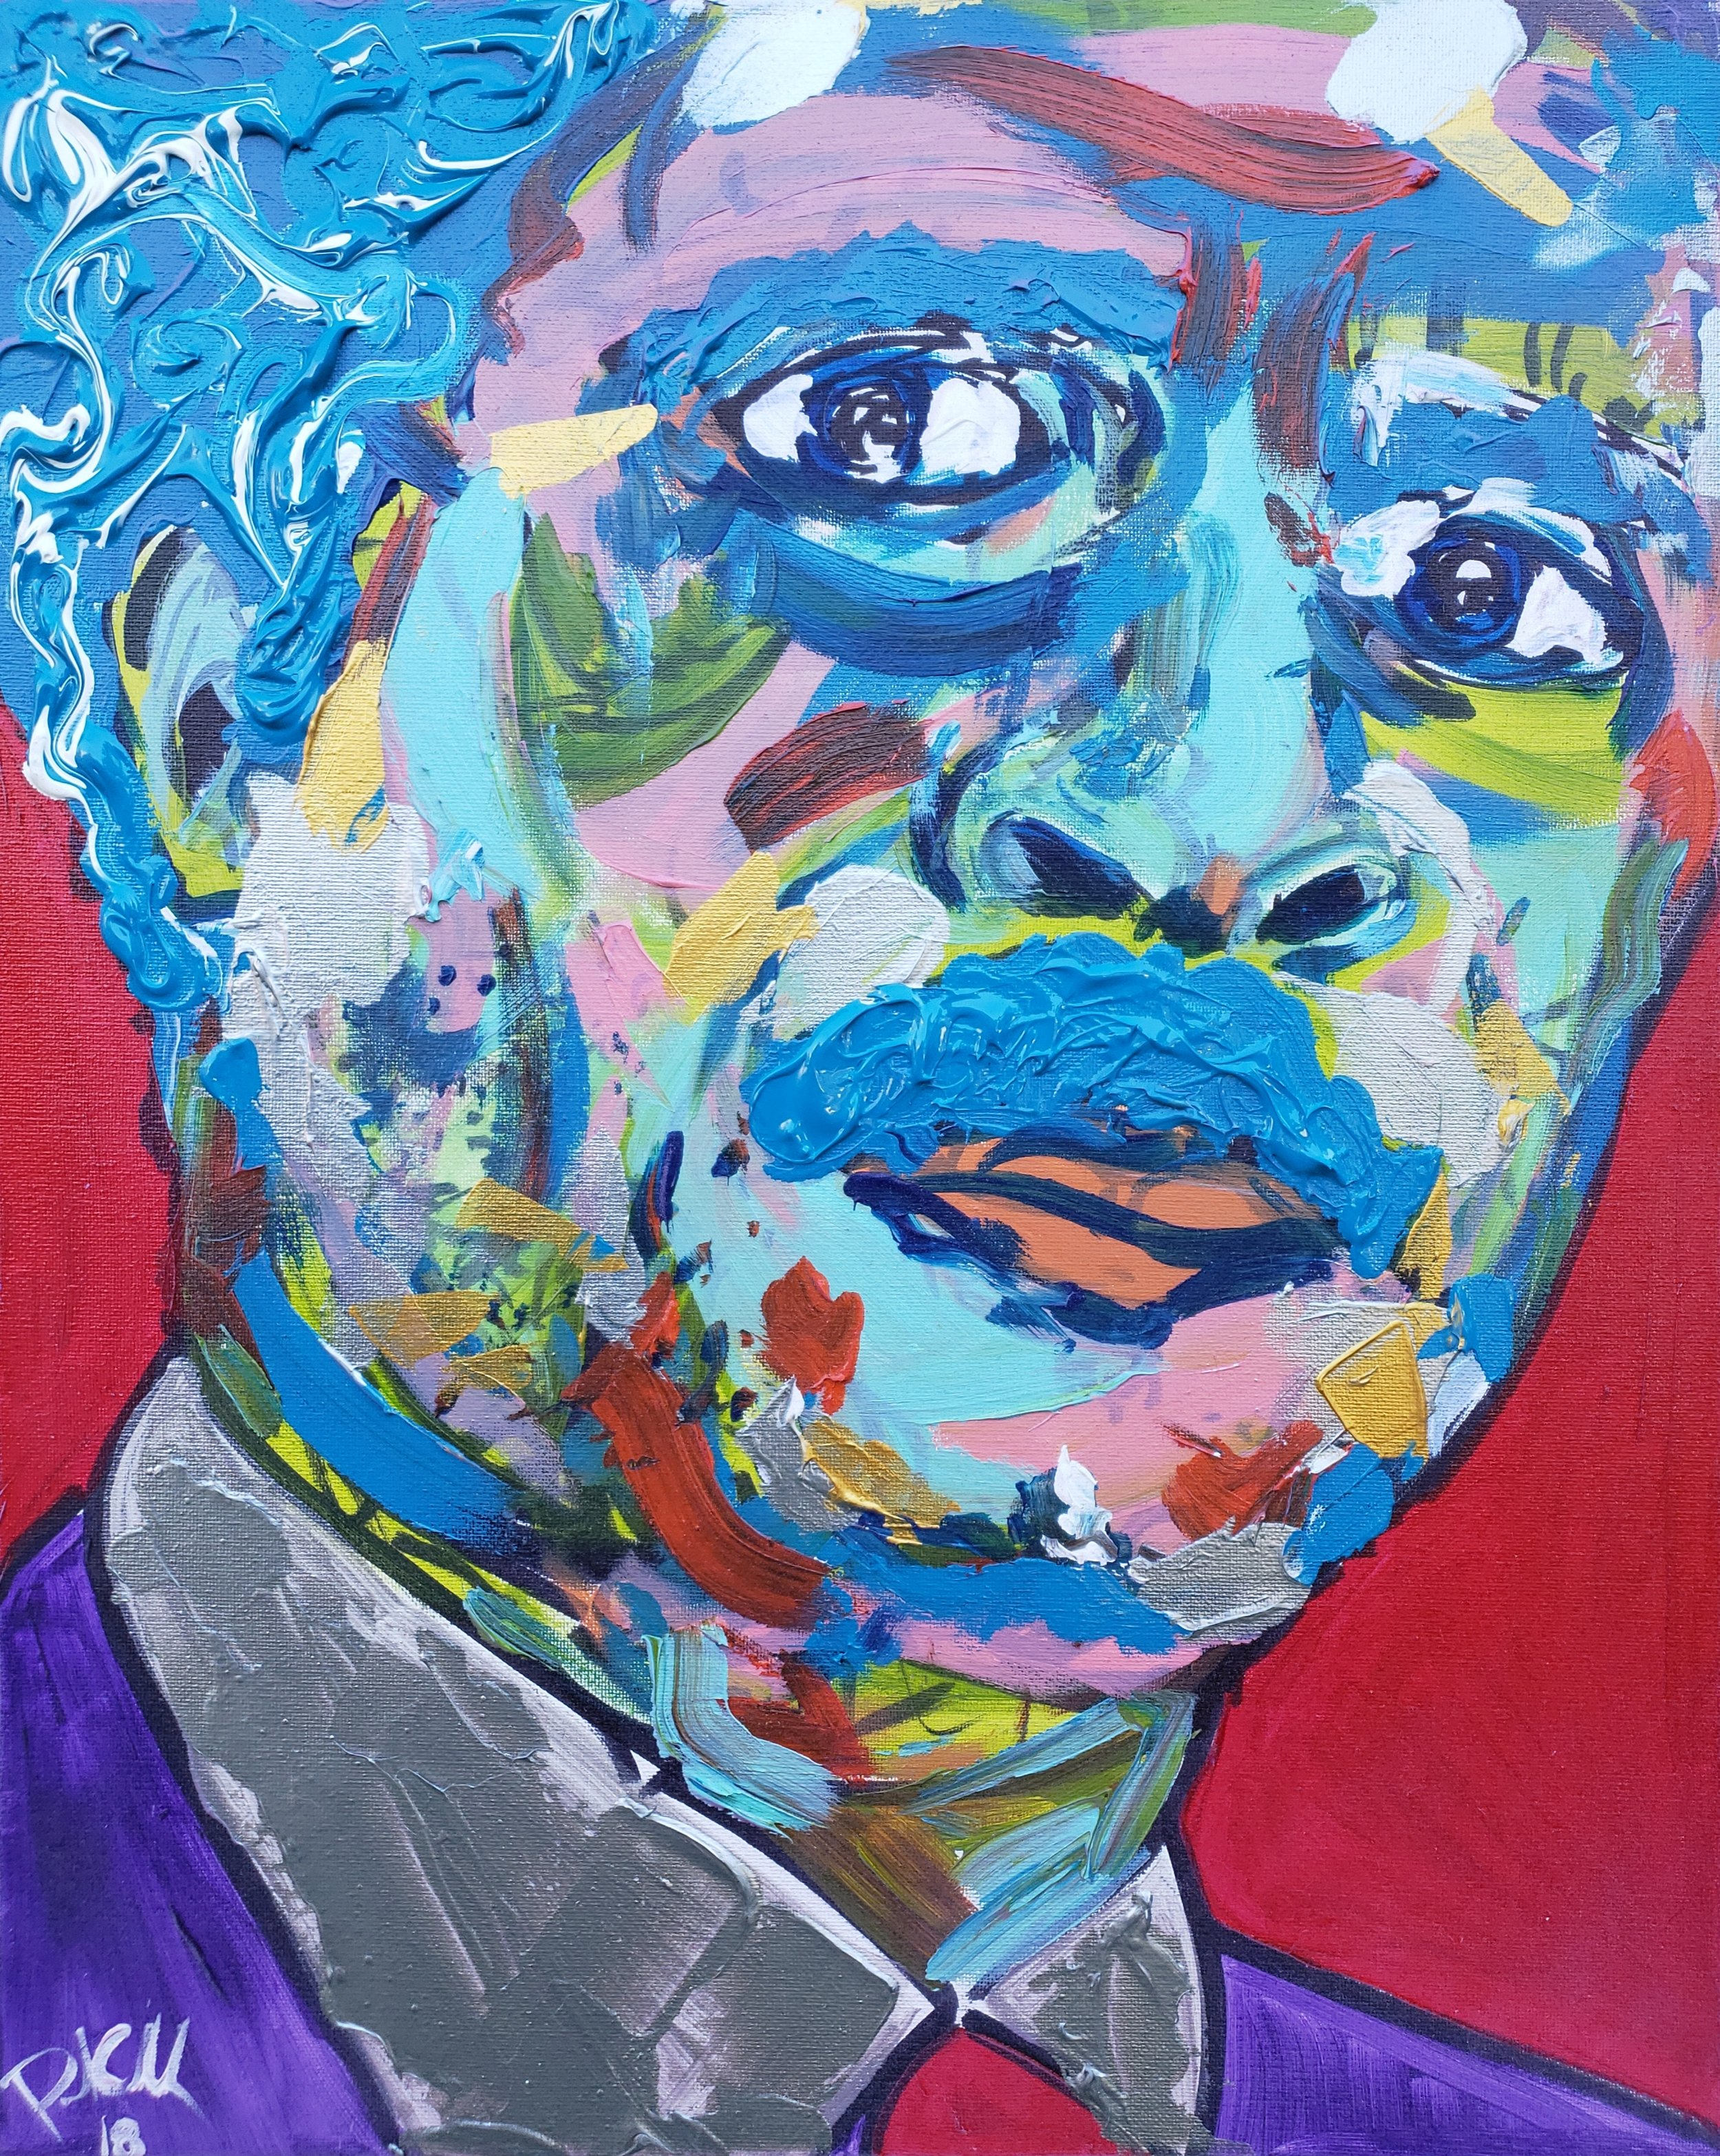 Mr. Pryor / 20 x 16 / Acrylic / Spray Paint / Marker / 2018.